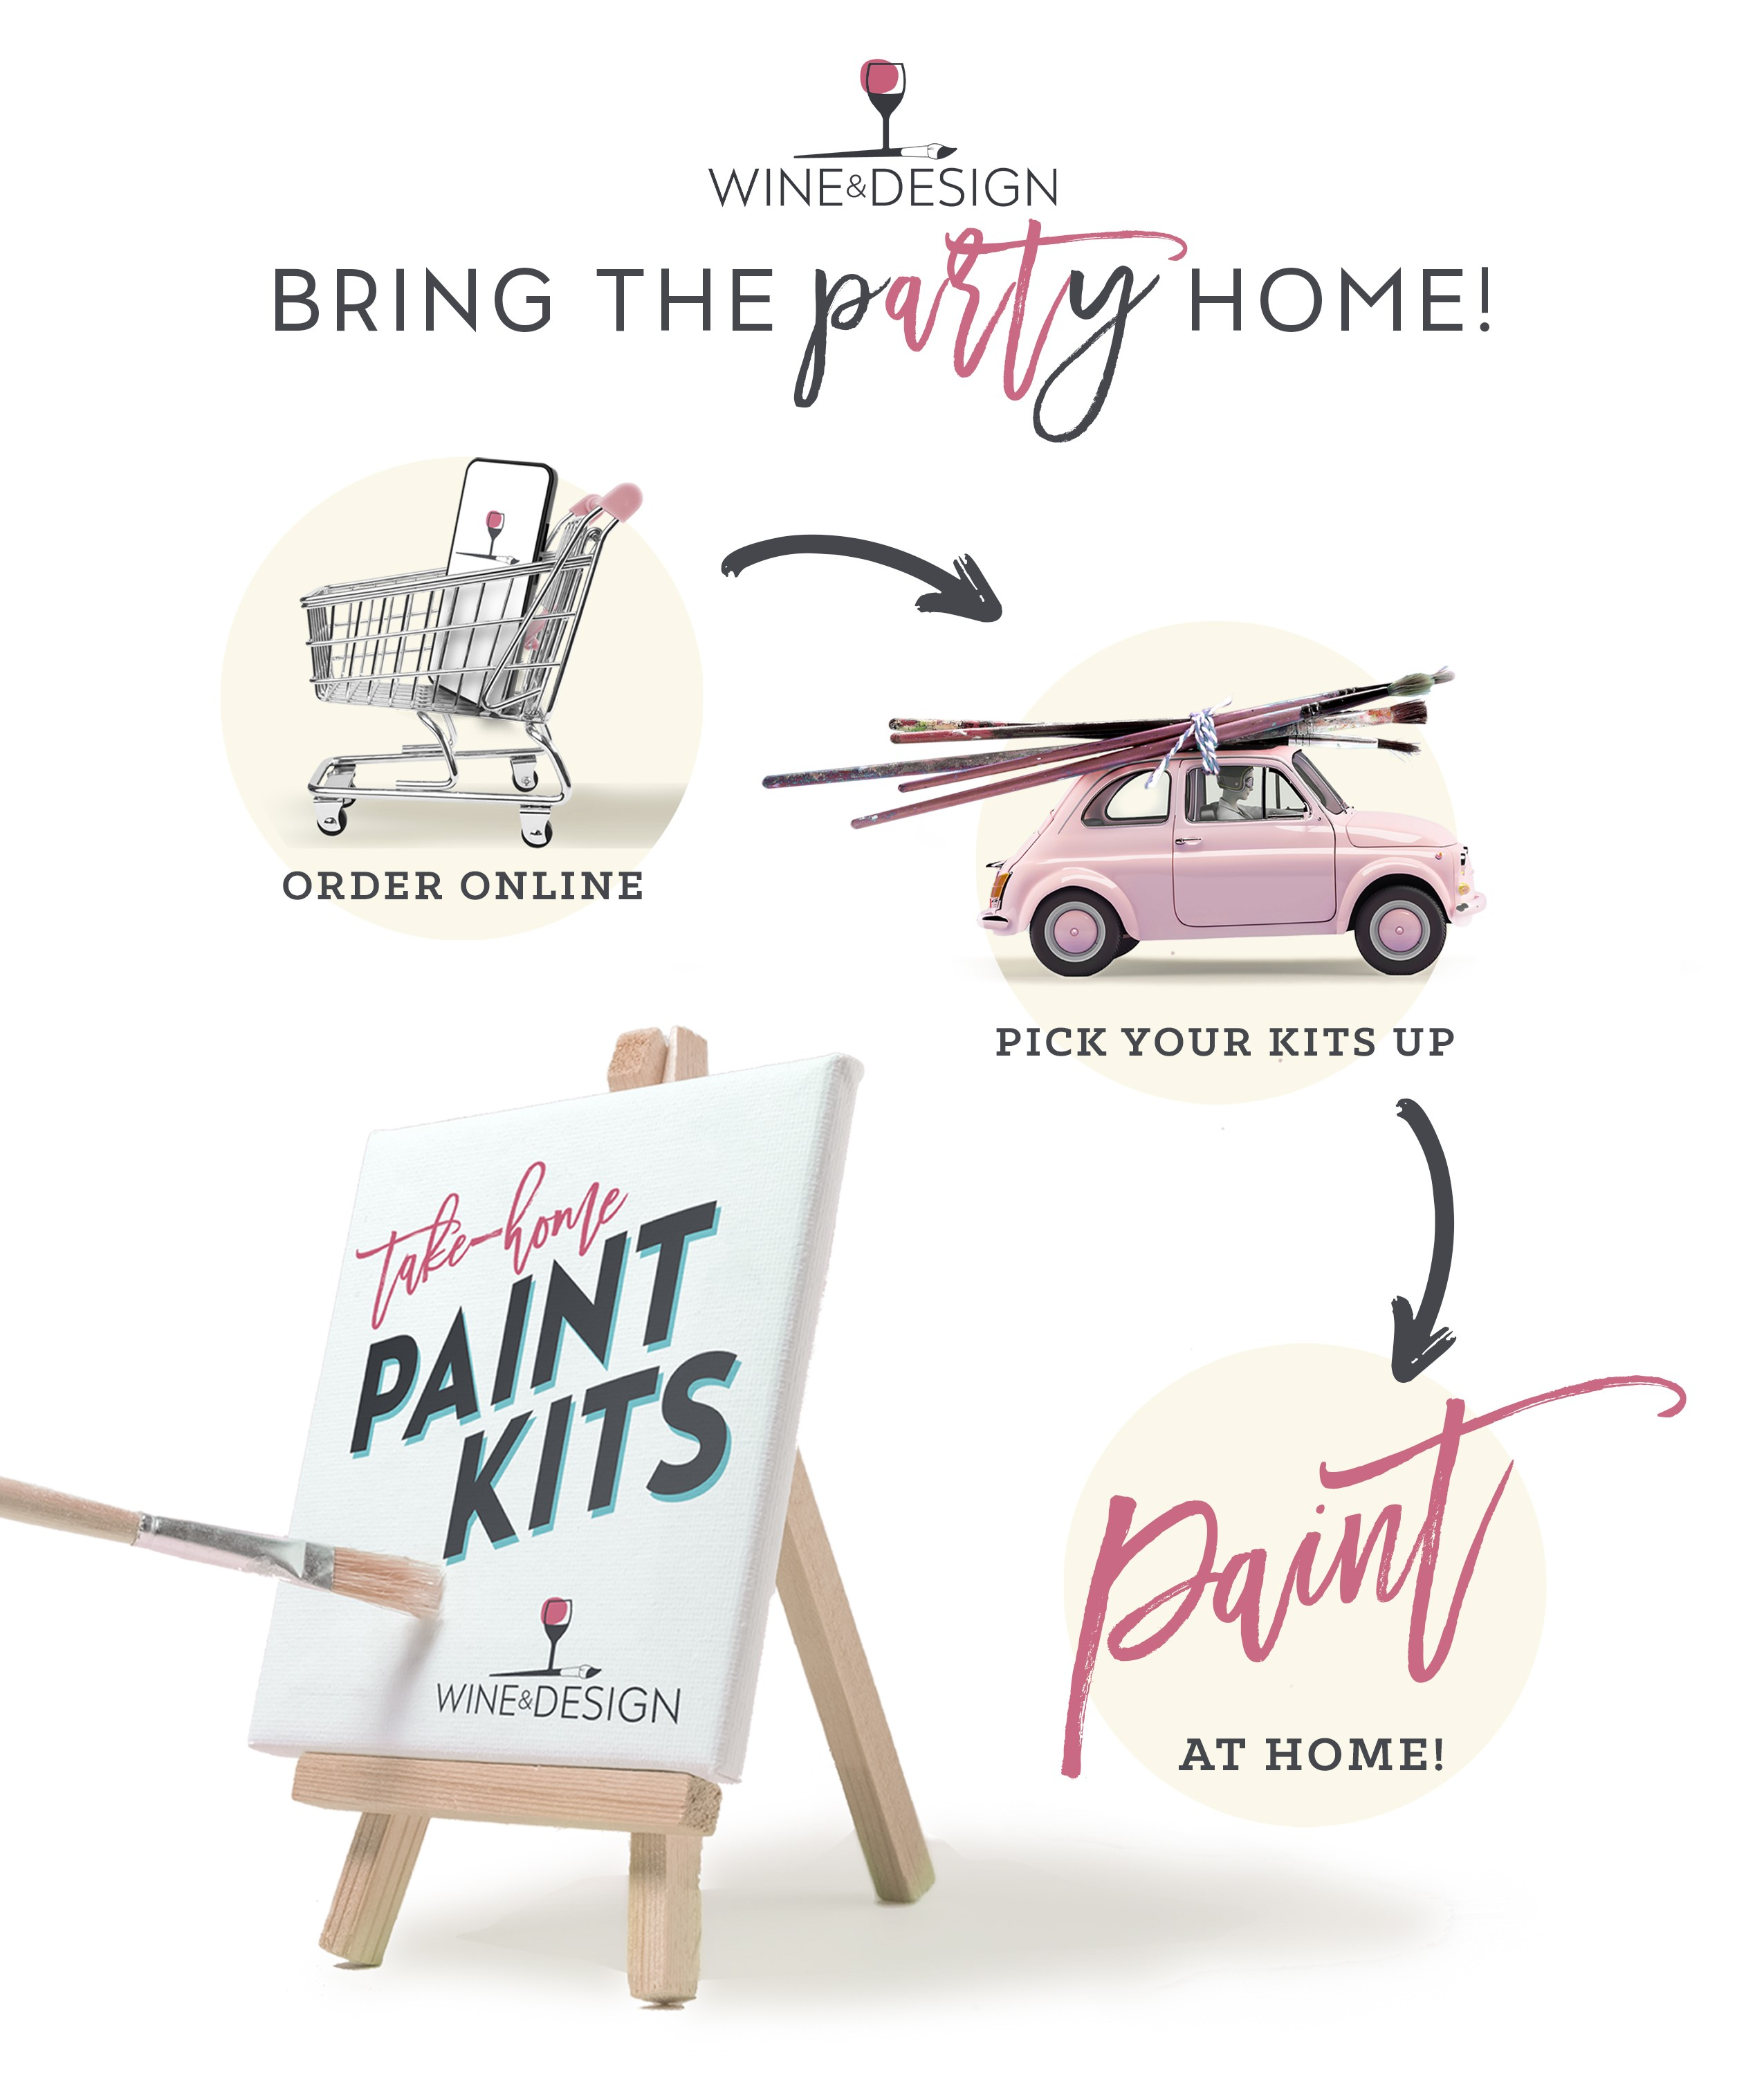 Take-Home Paint Kit